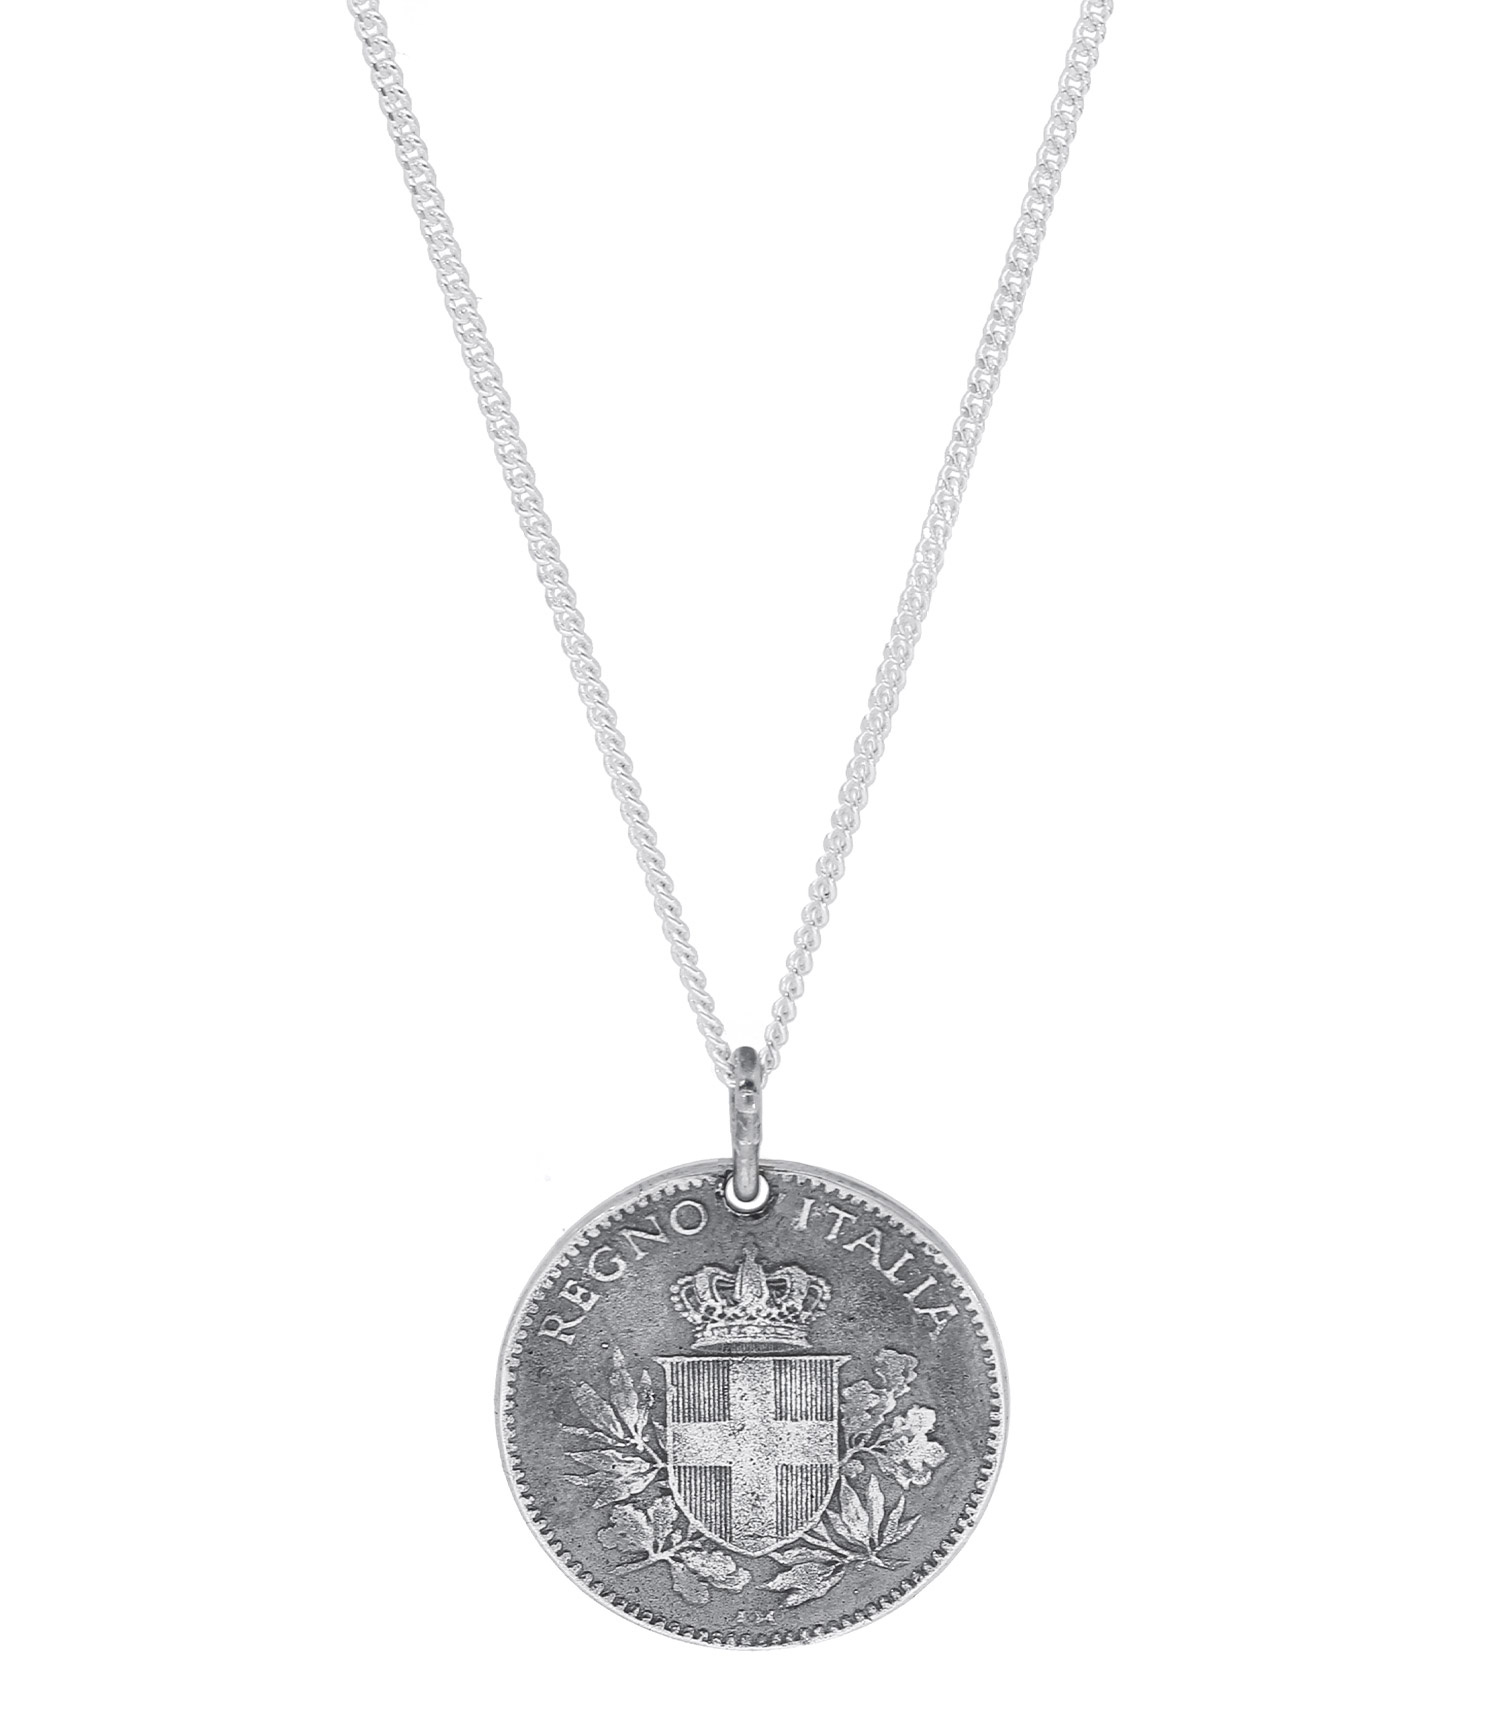 collier argent italie